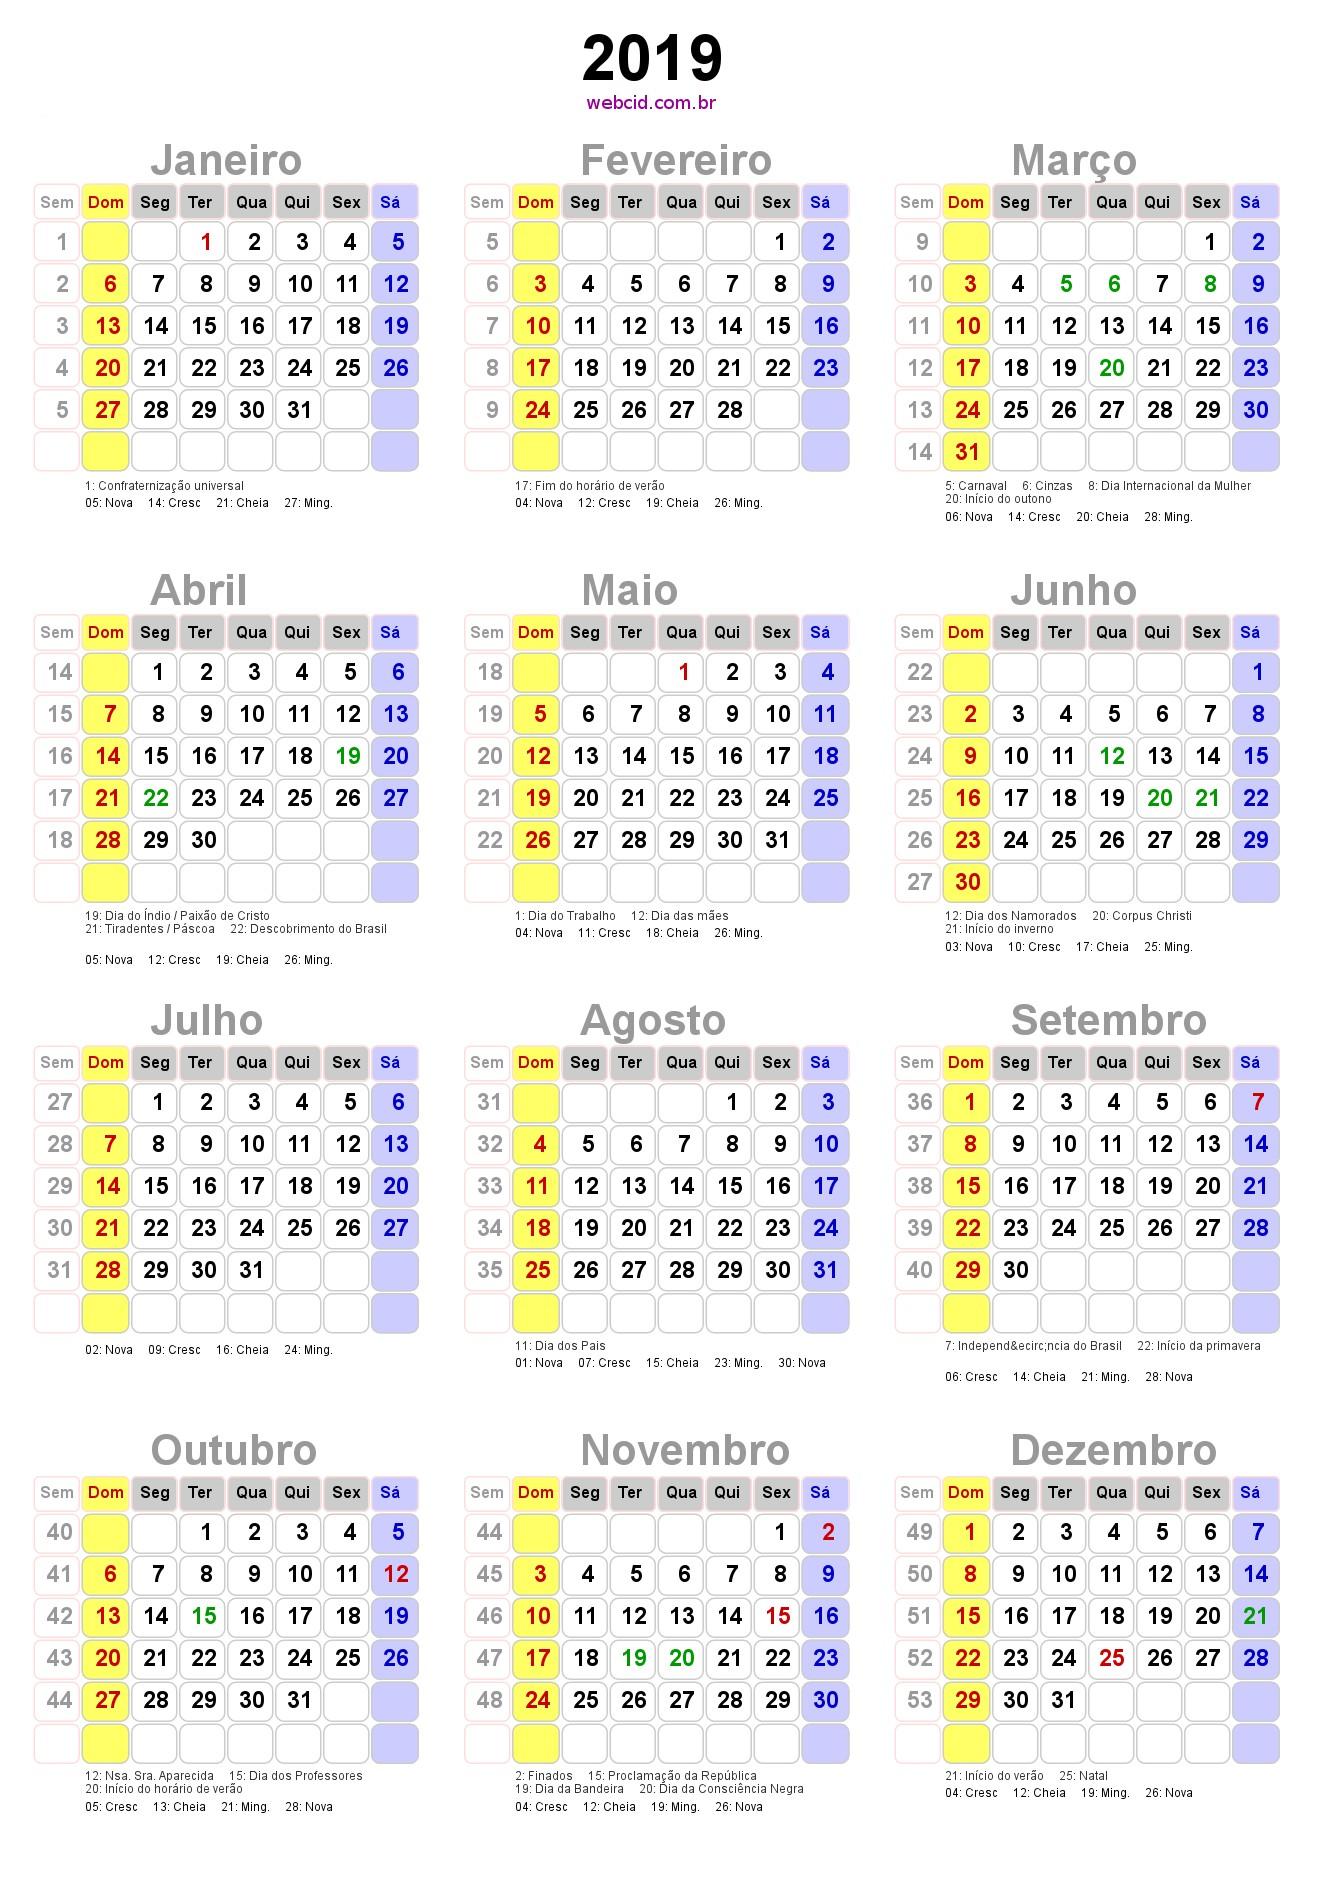 calendario webcid 2019